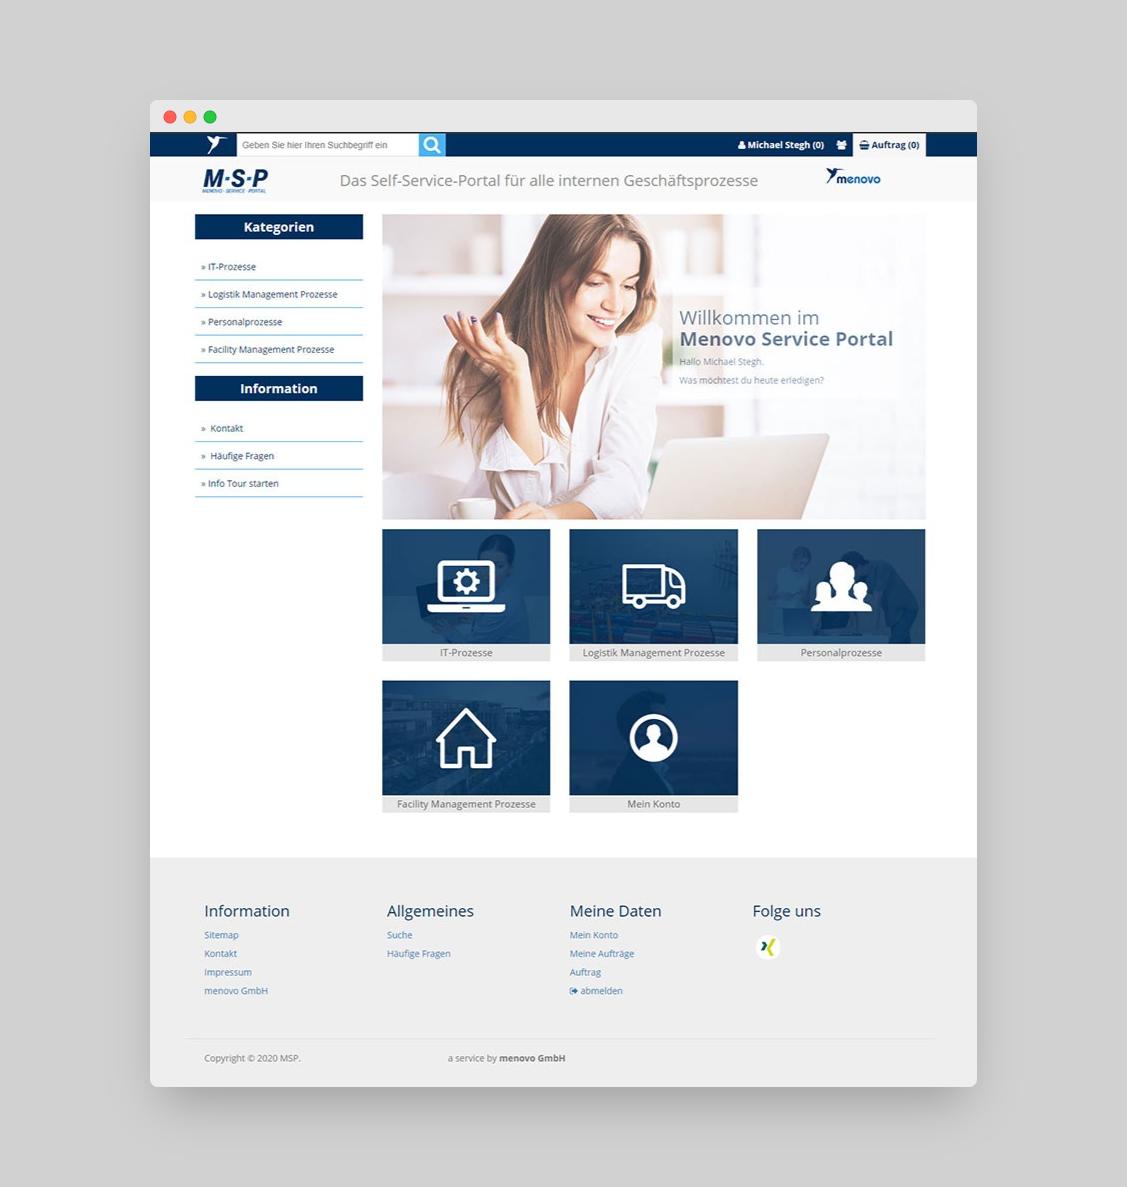 Menovo Service Portal